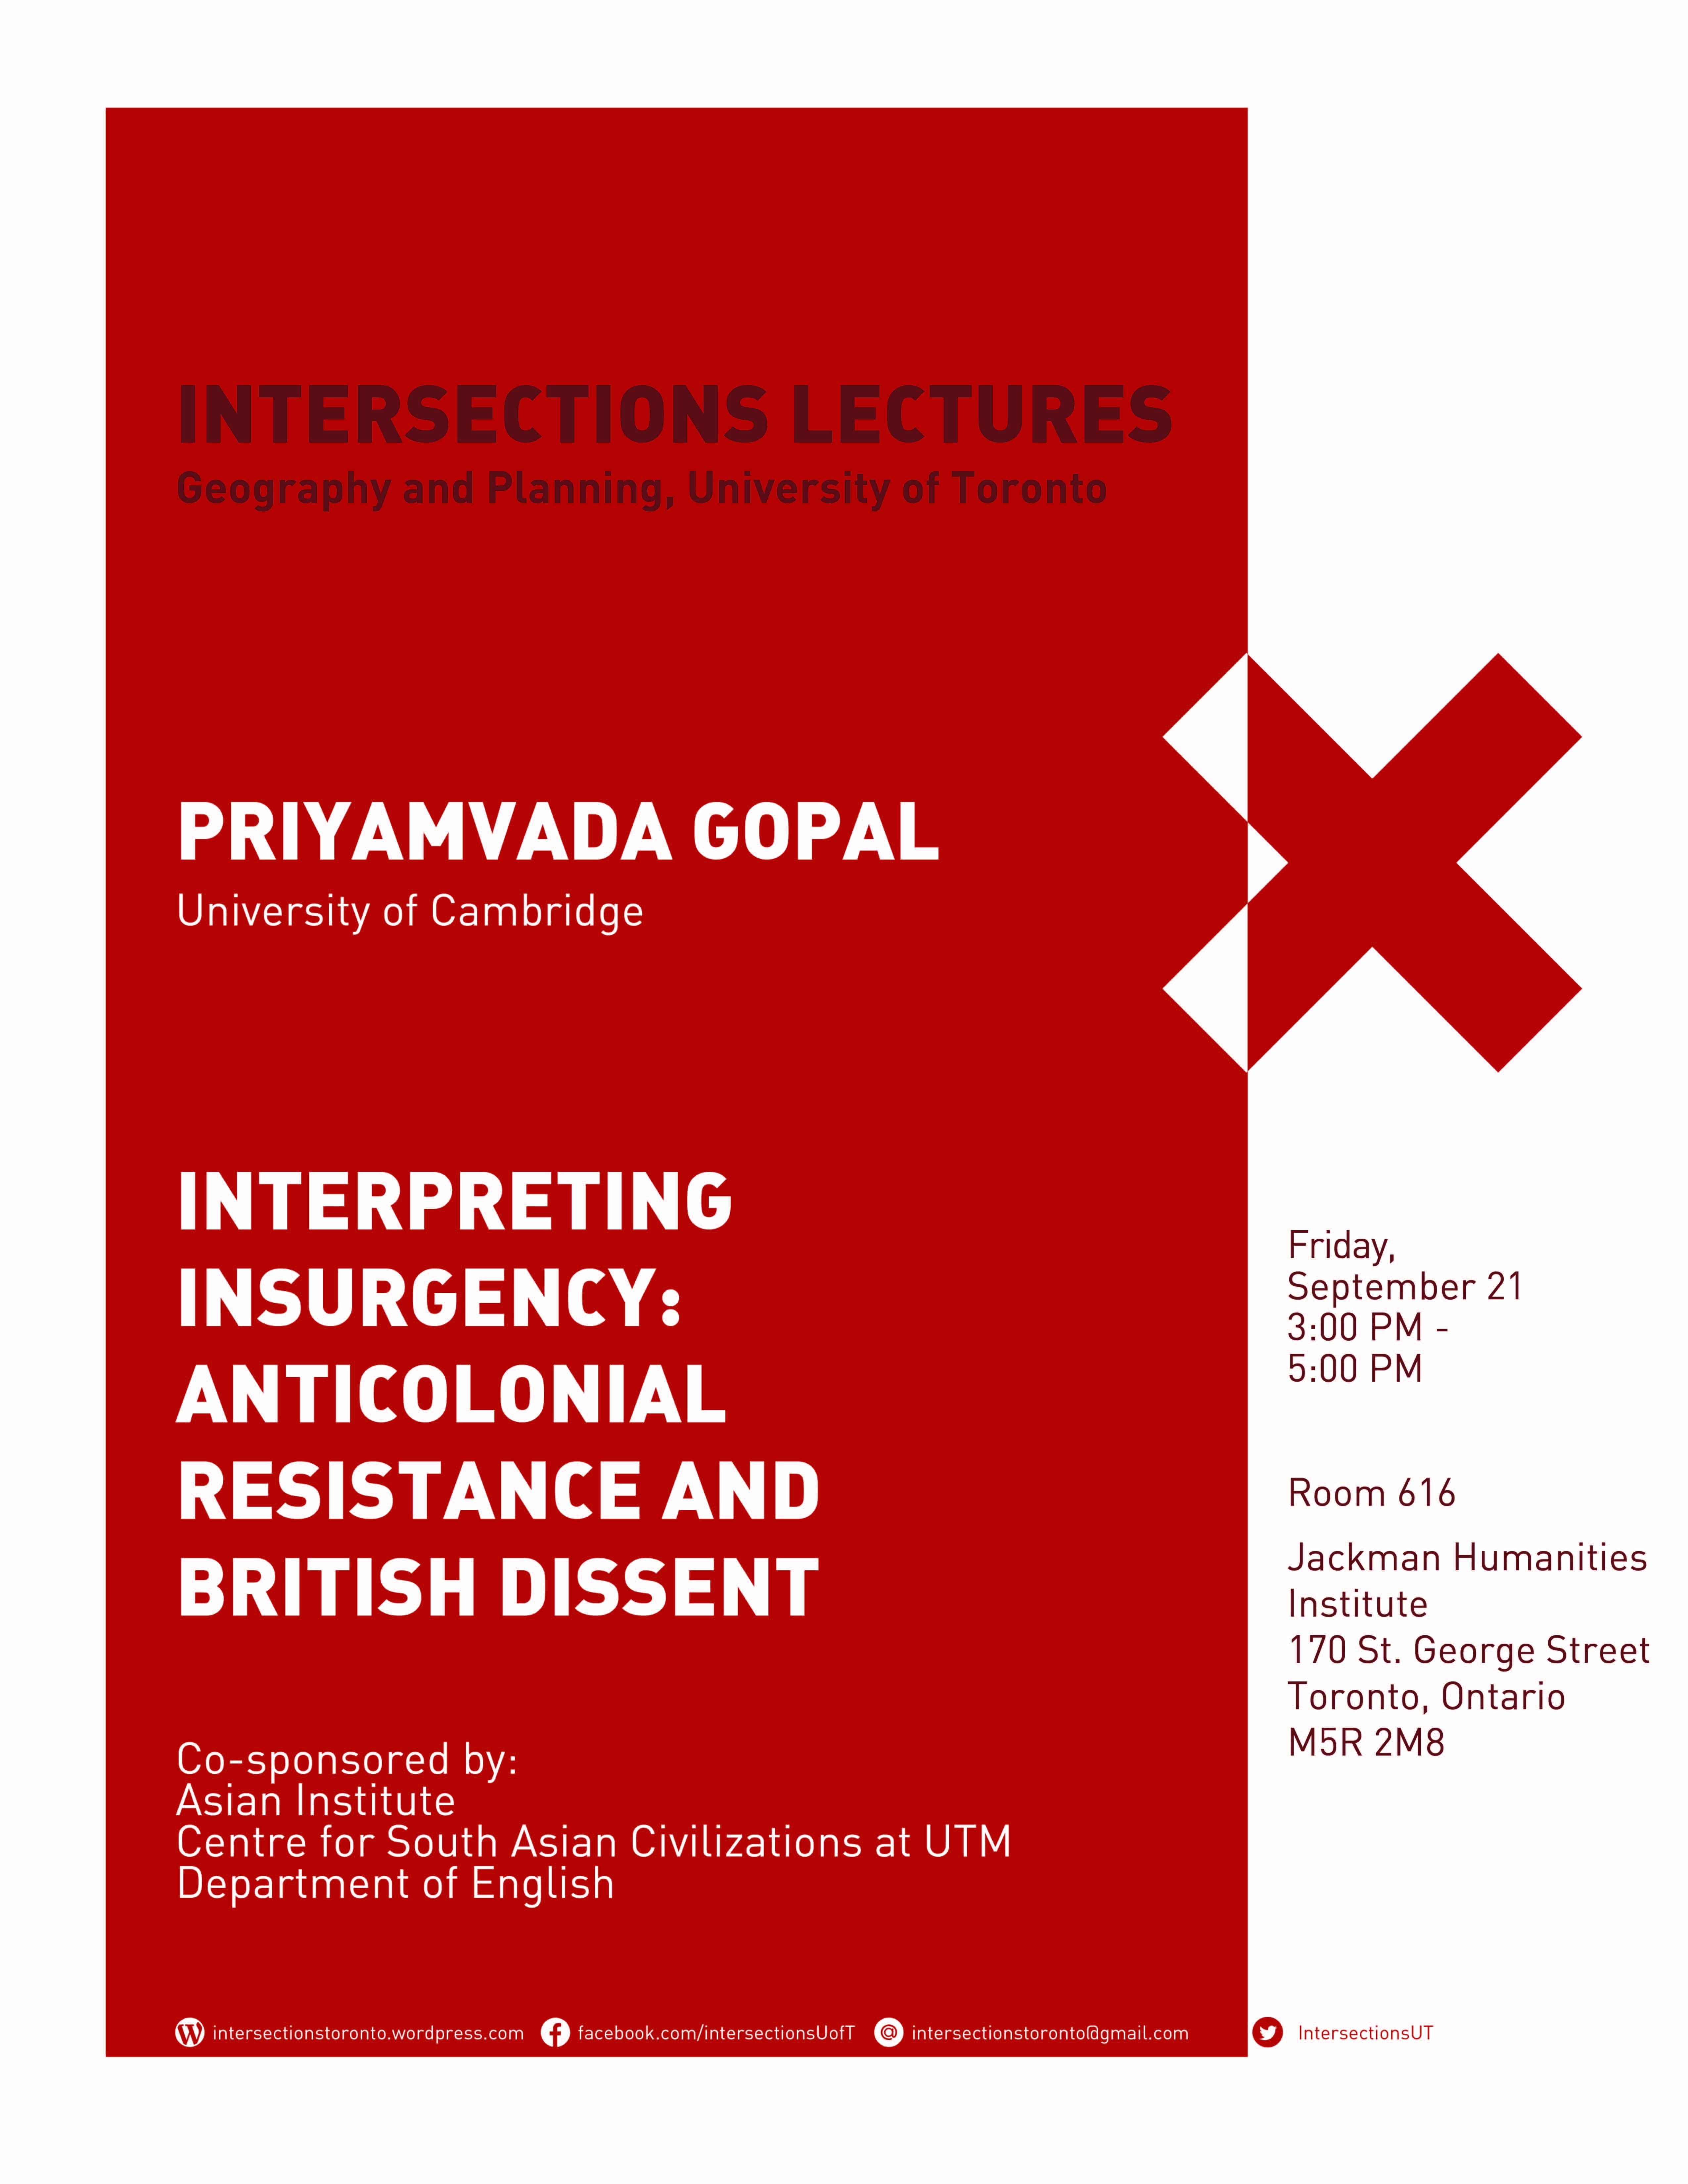 01_Priyamvada Gopal_Poster_Priyamvada Gopal